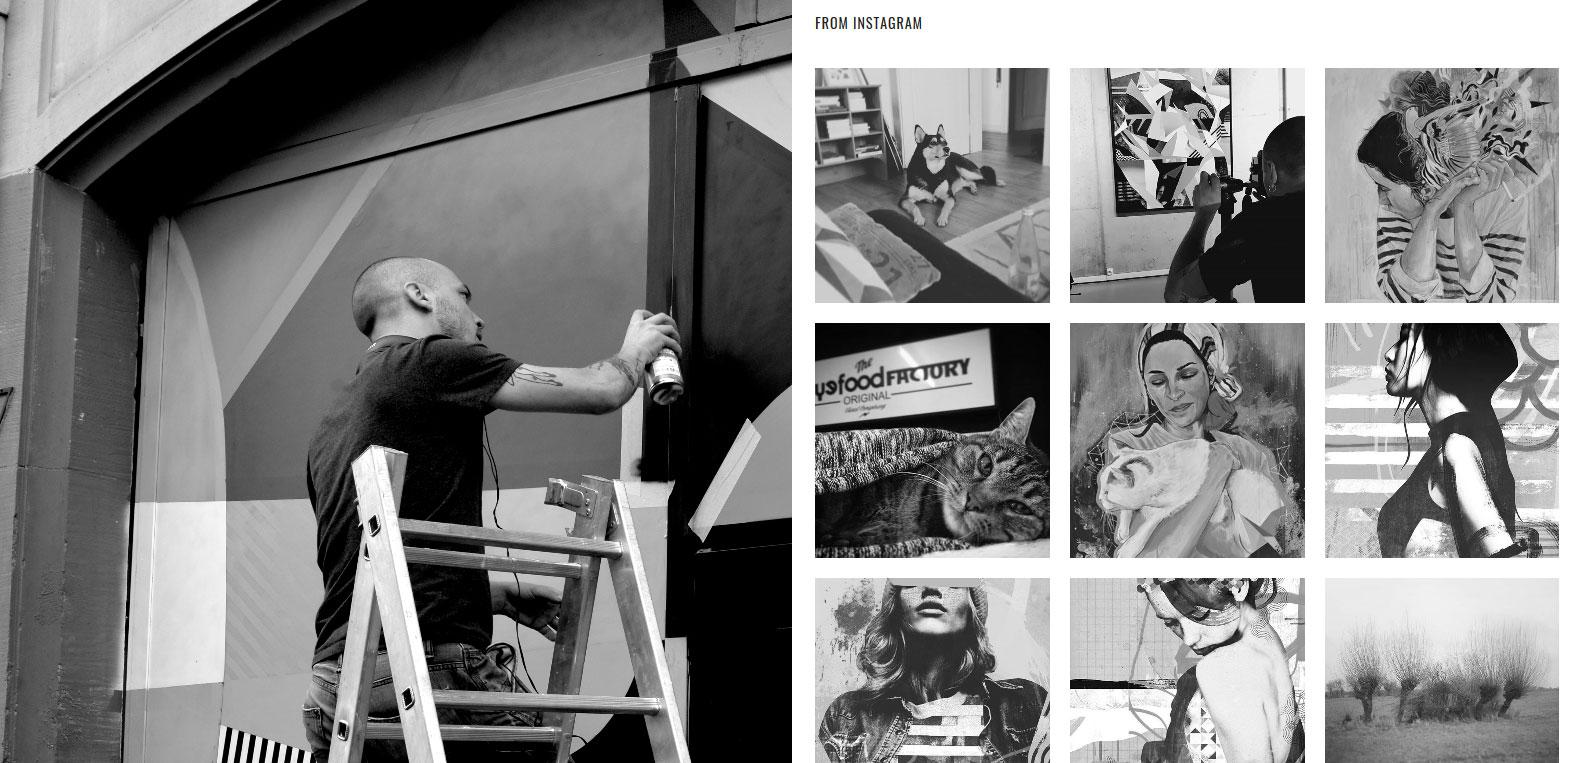 Nicolas blind sur instagram. Artiste et client Karedess agency, agence digitale à Mulhouse